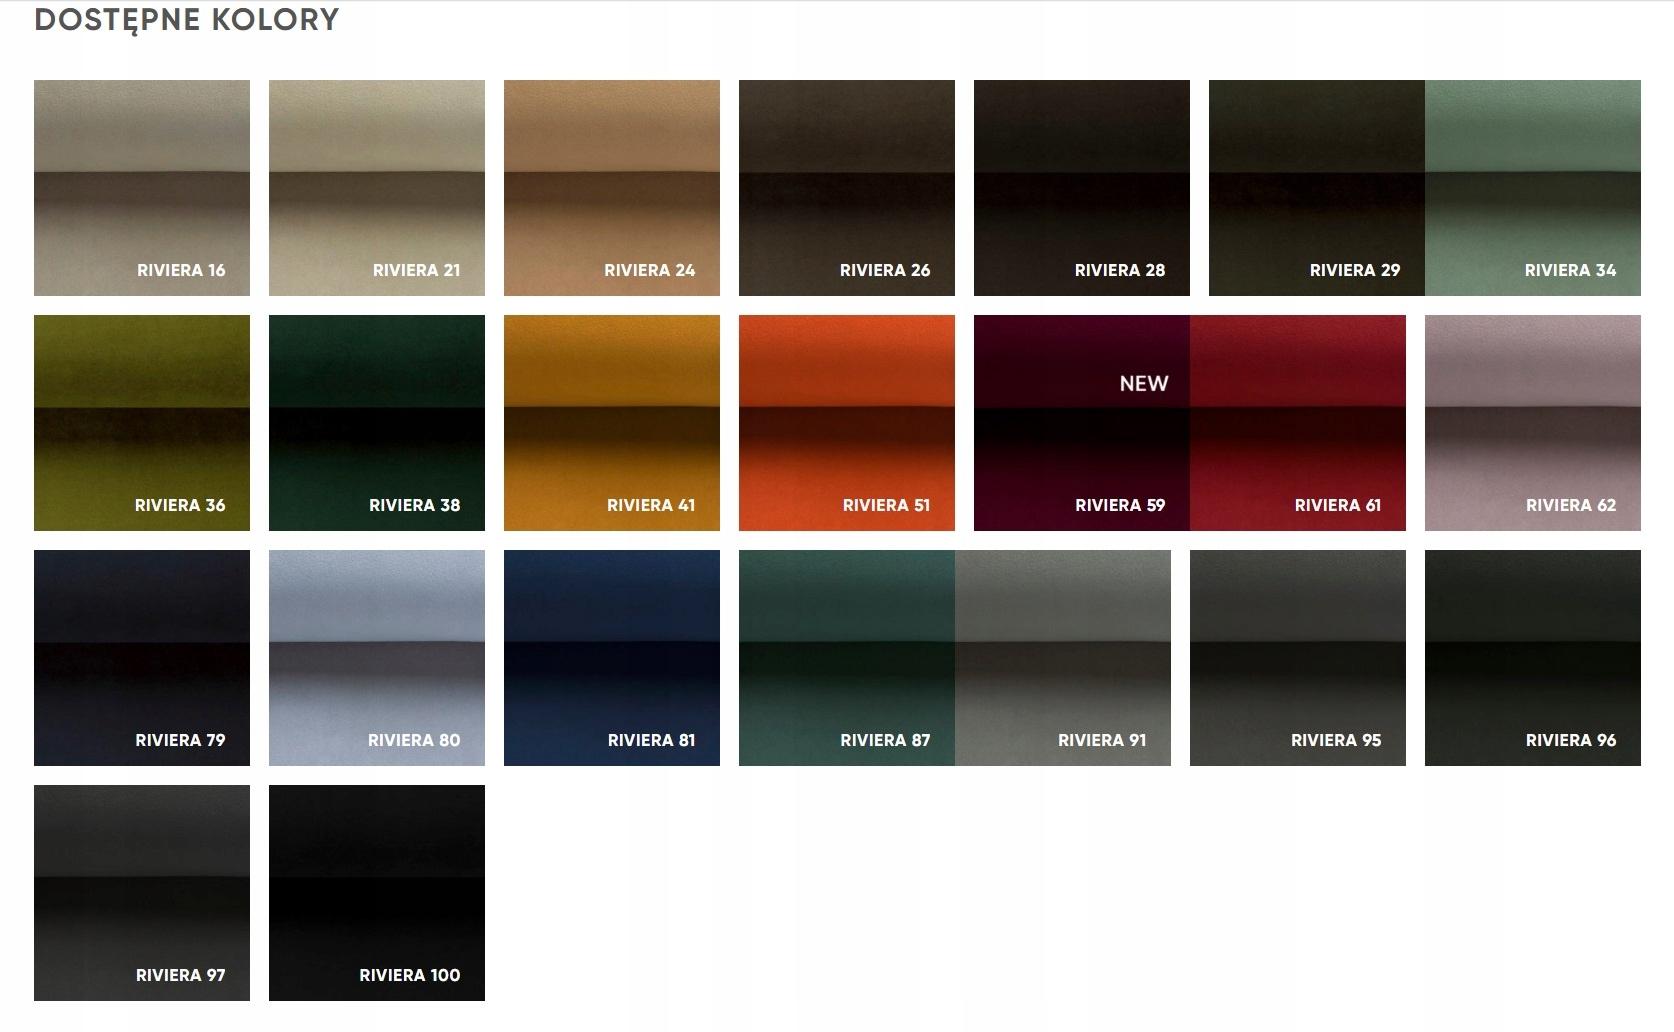 FOTEL USZAK STYL SKANDYNAWSKI -BORDOWY Kolor korpusu inny kolor